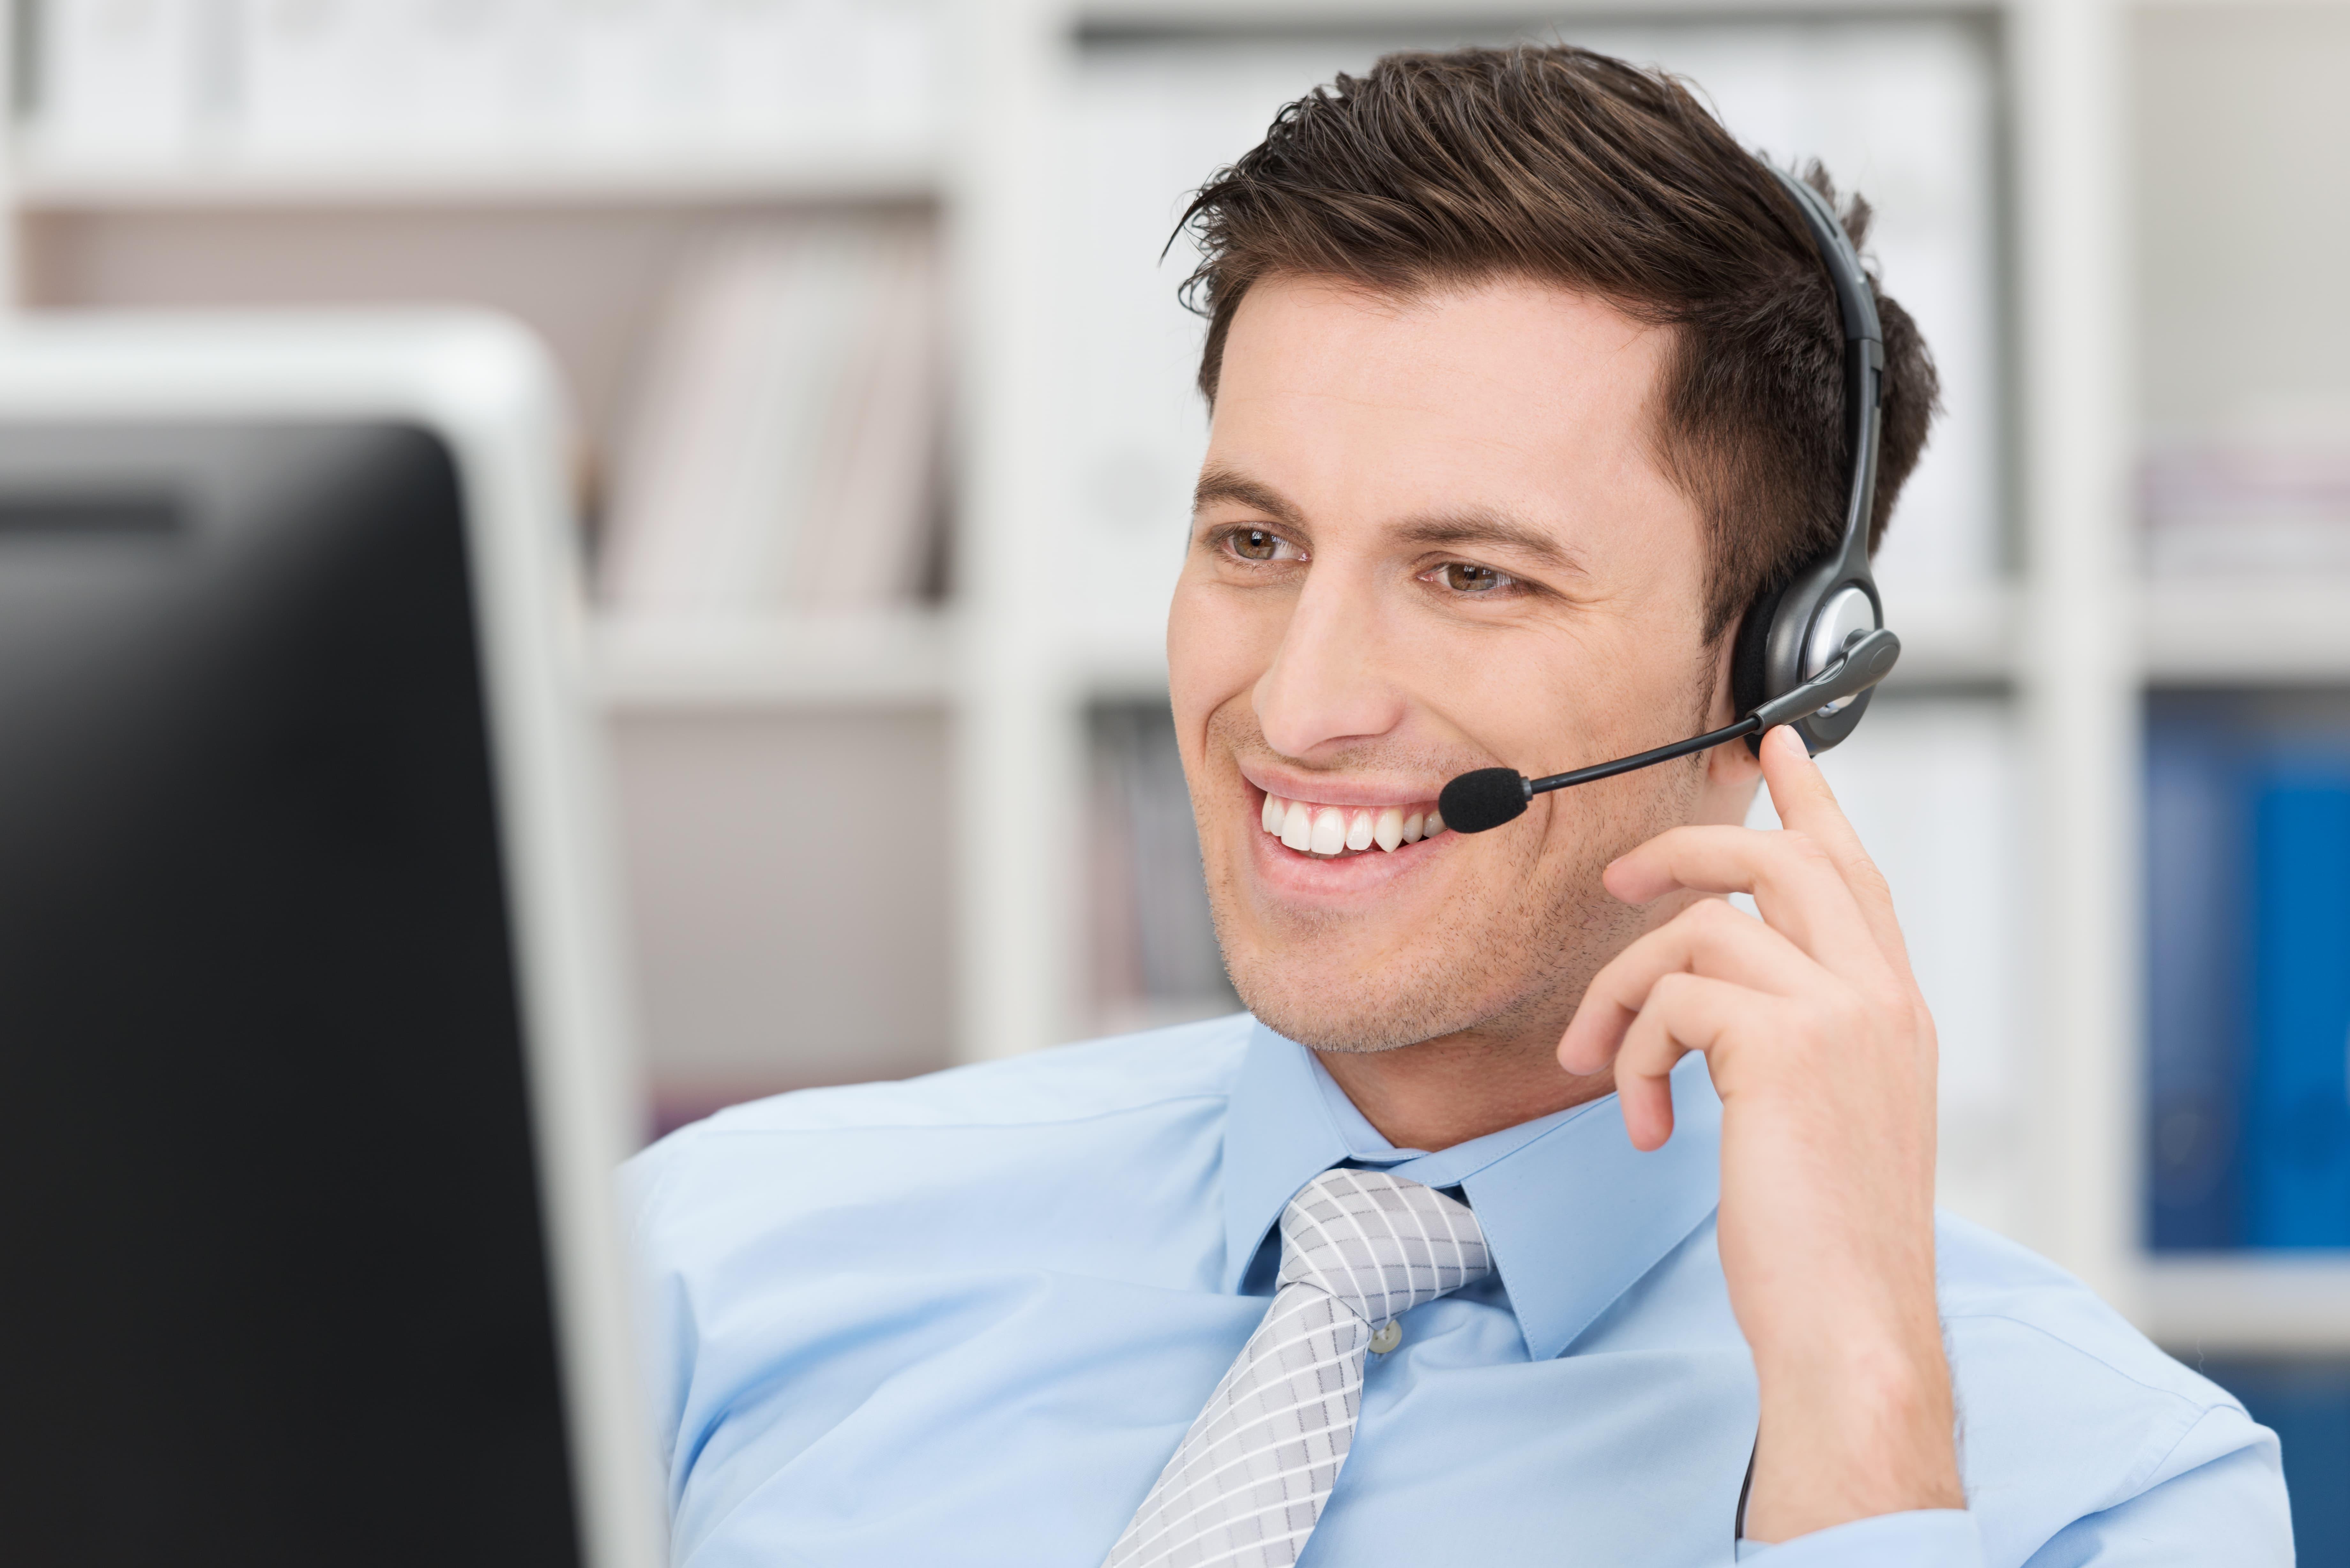 A smiling man talking through a headset.